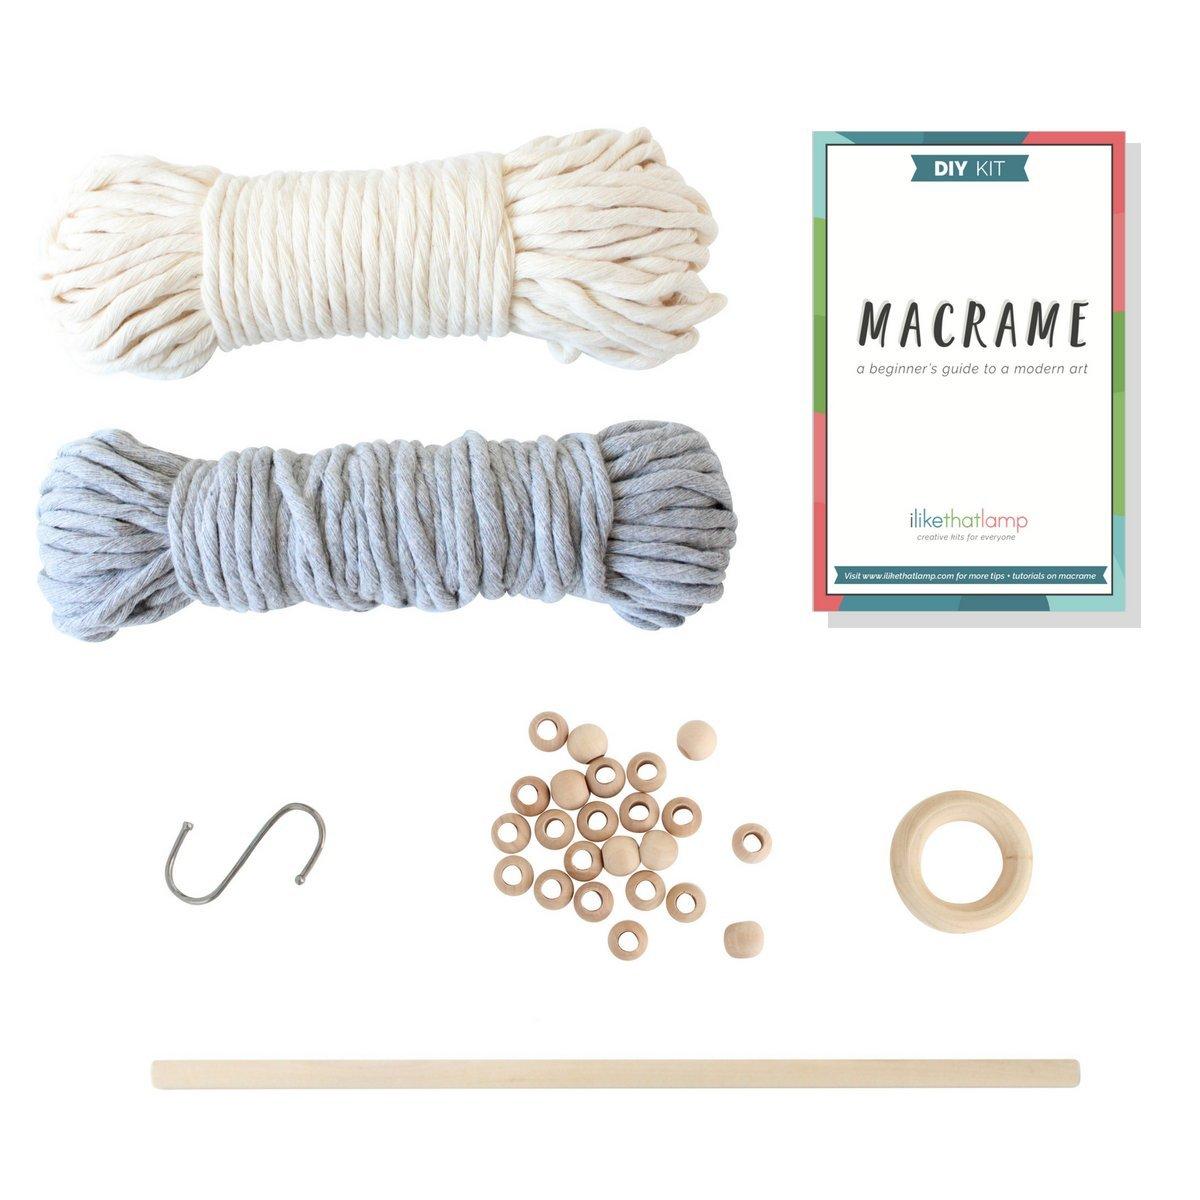 2 Macrame Kits in 1 – Macrame Wall Hanging Kit and Macrame Plant Hanger Kit - Complete Macrame Starter Kit with Macrame Supplies